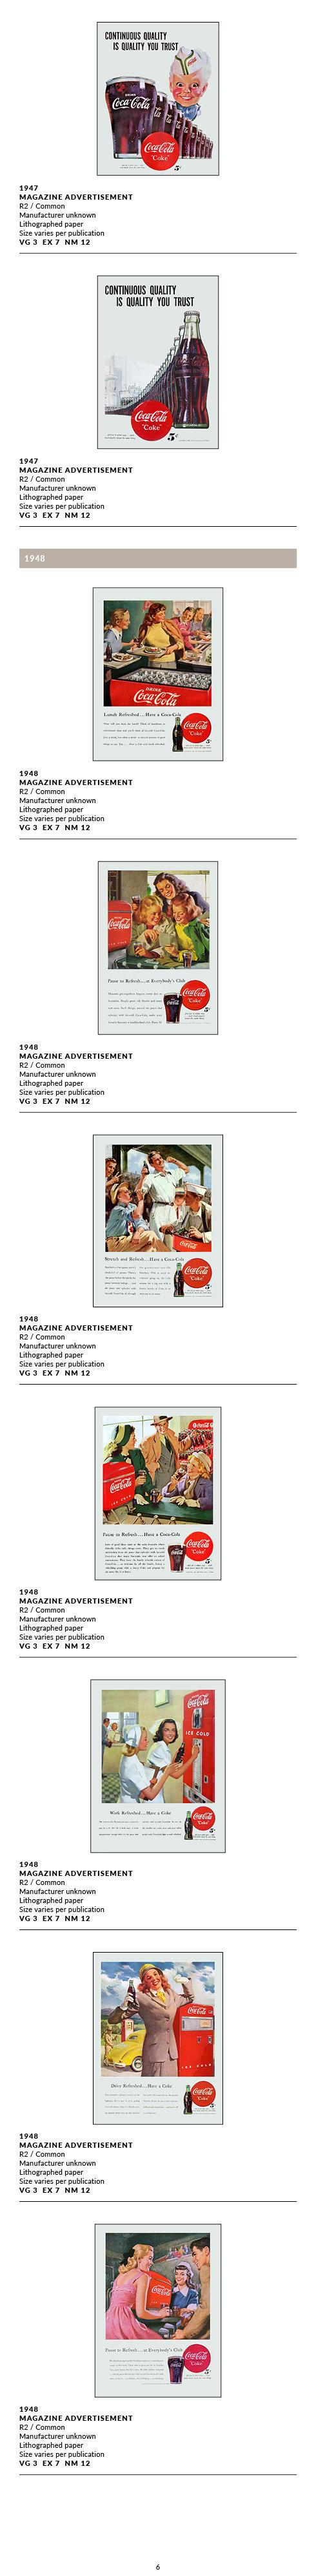 Desktop 1940-49 Ads_6.jpg